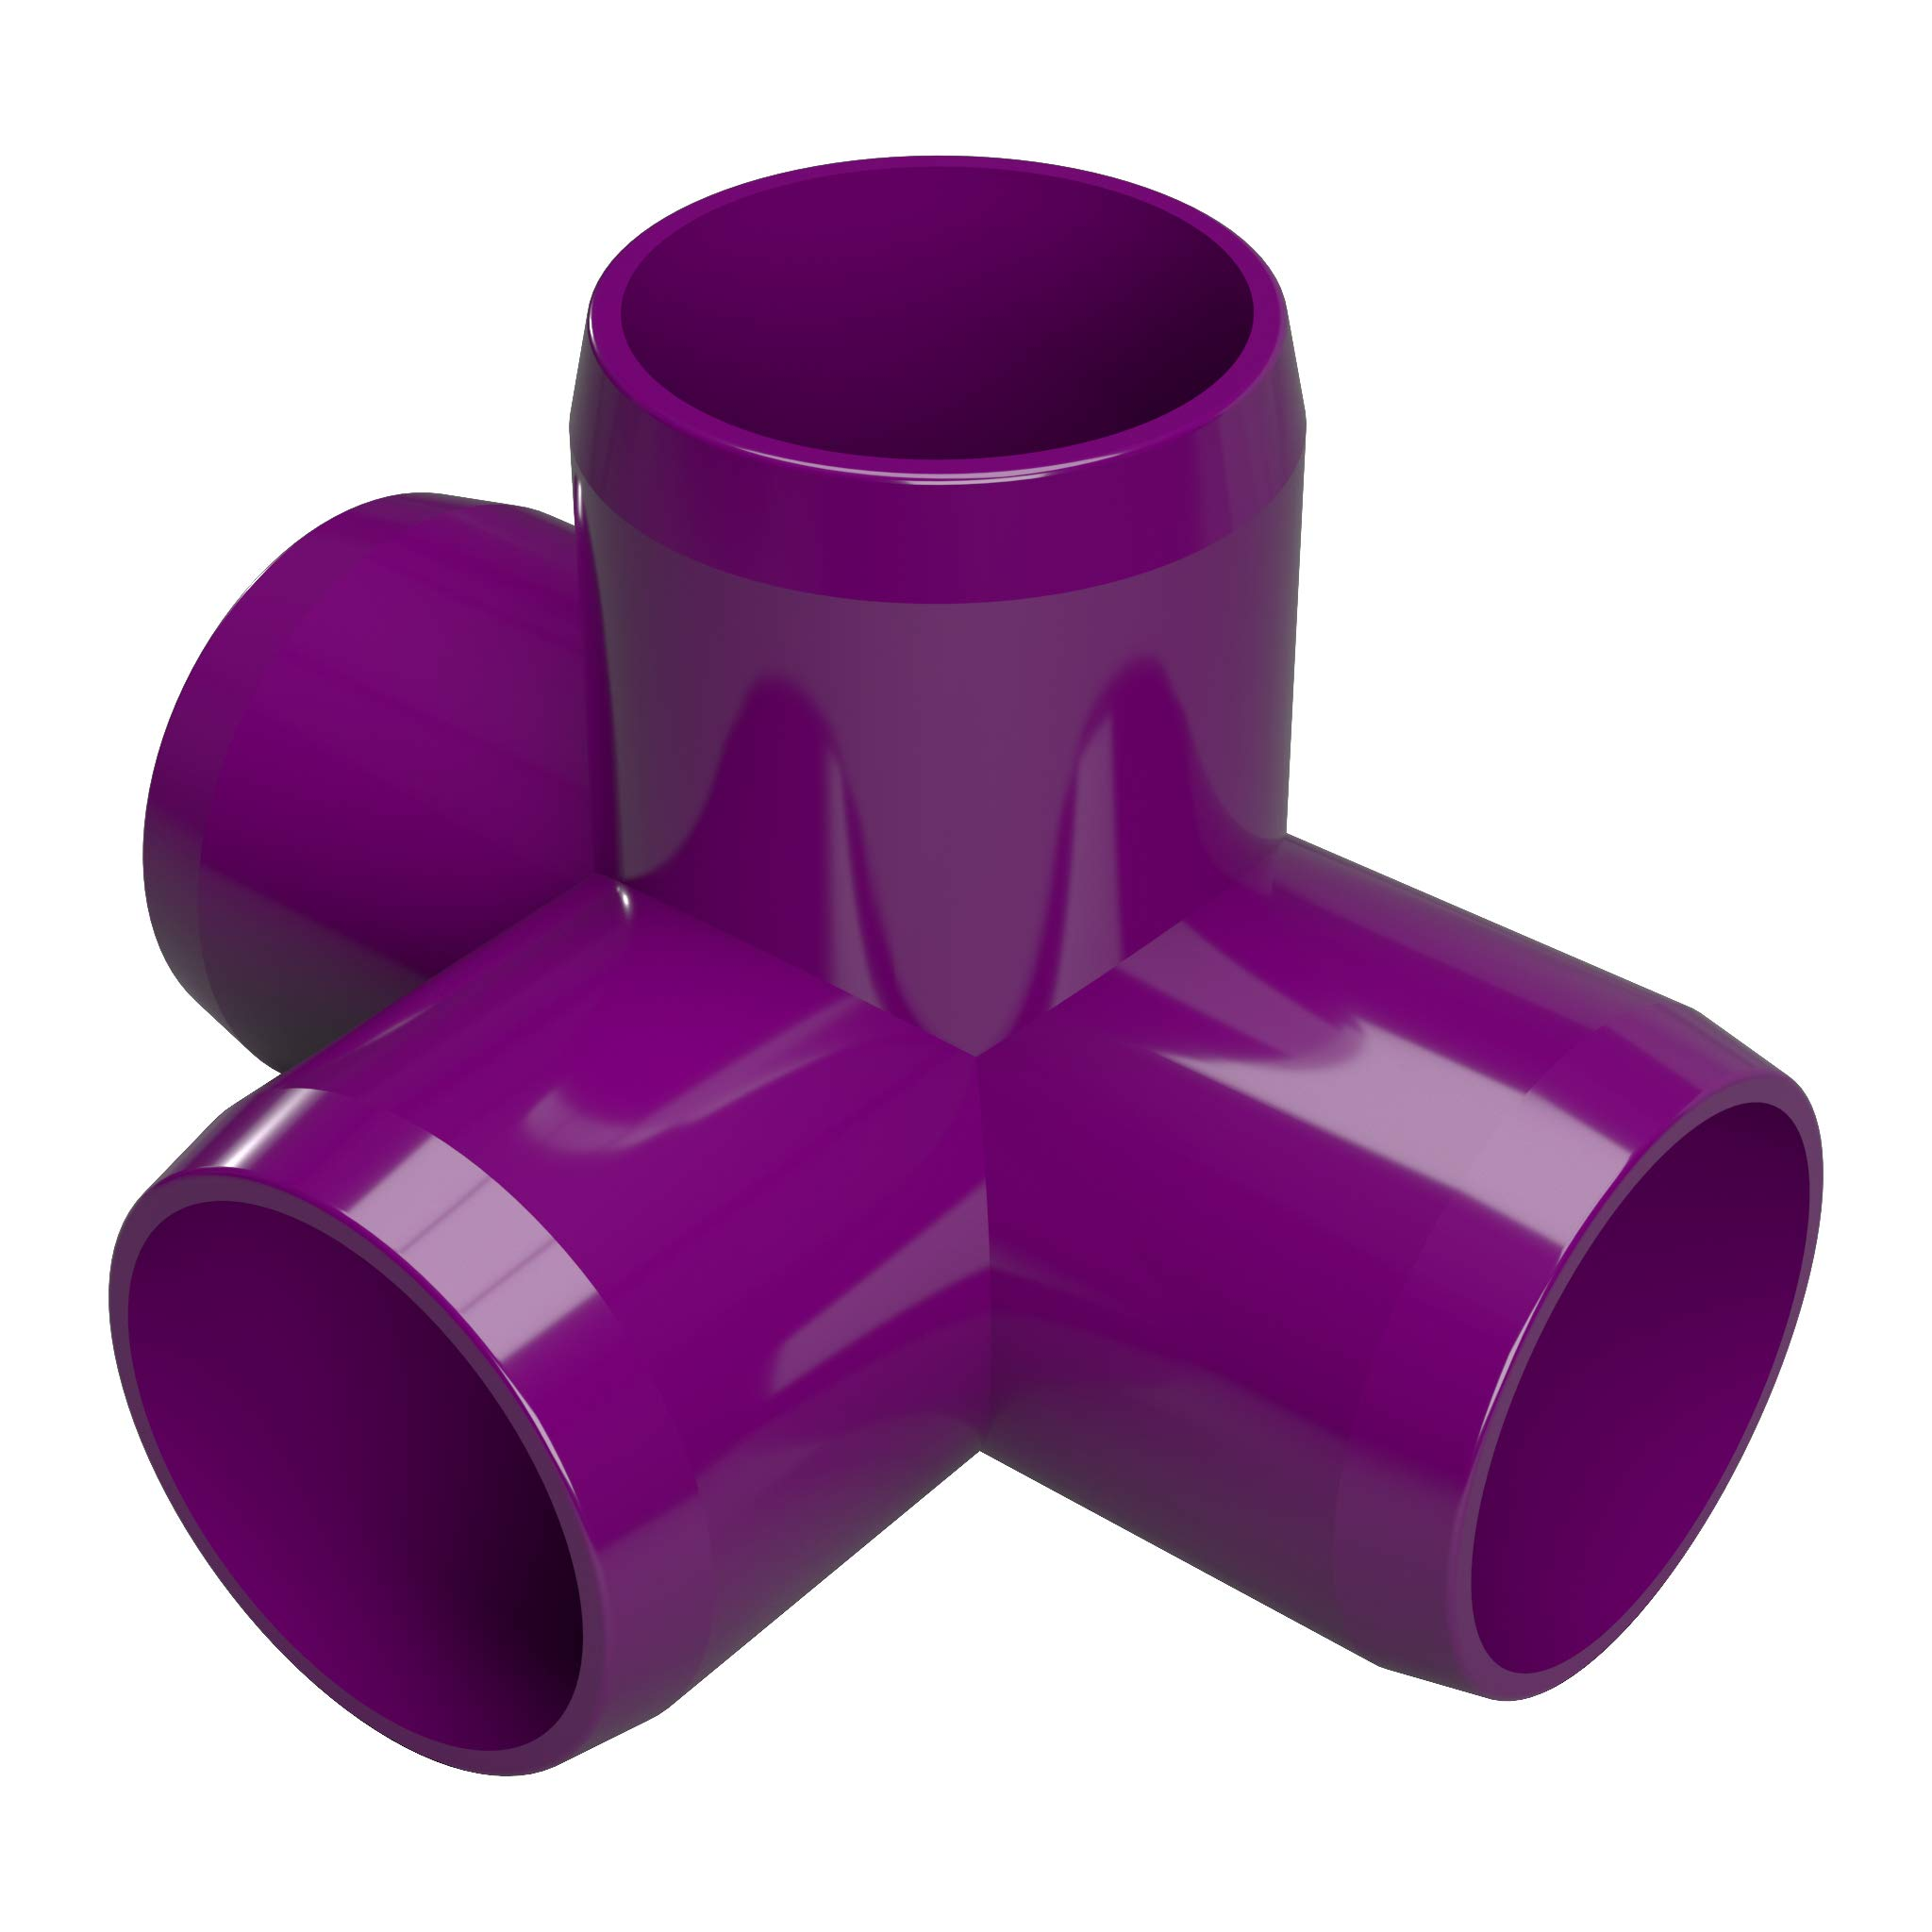 FORMUFIT F0124WT-PU-10 4-Way Tee PVC Fitting, Furniture Grade, 1/2'' Size, Purple (Pack of 10)